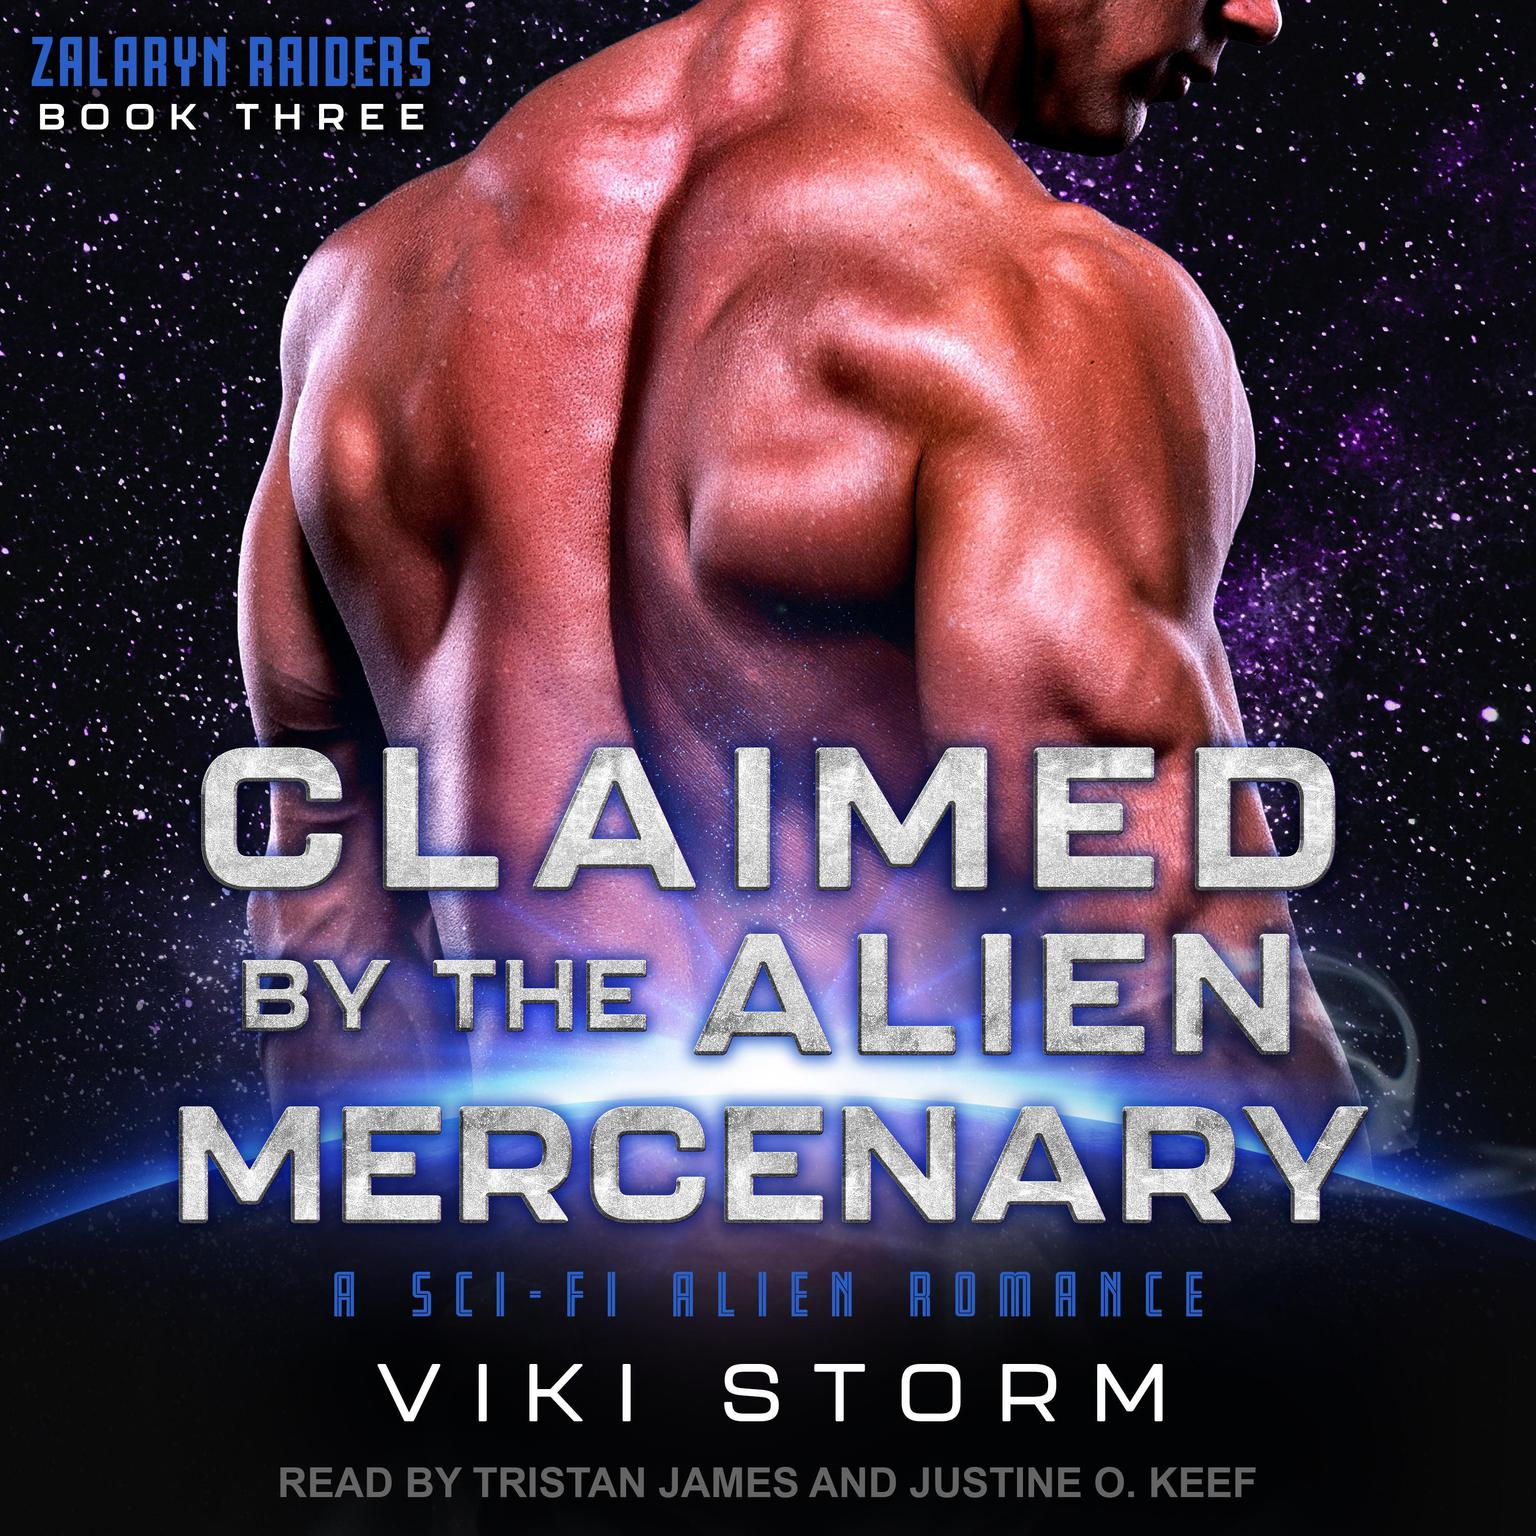 Claimed by the Alien Mercenary: A Sci-Fi Alien Romance Audiobook, by Viki Storm